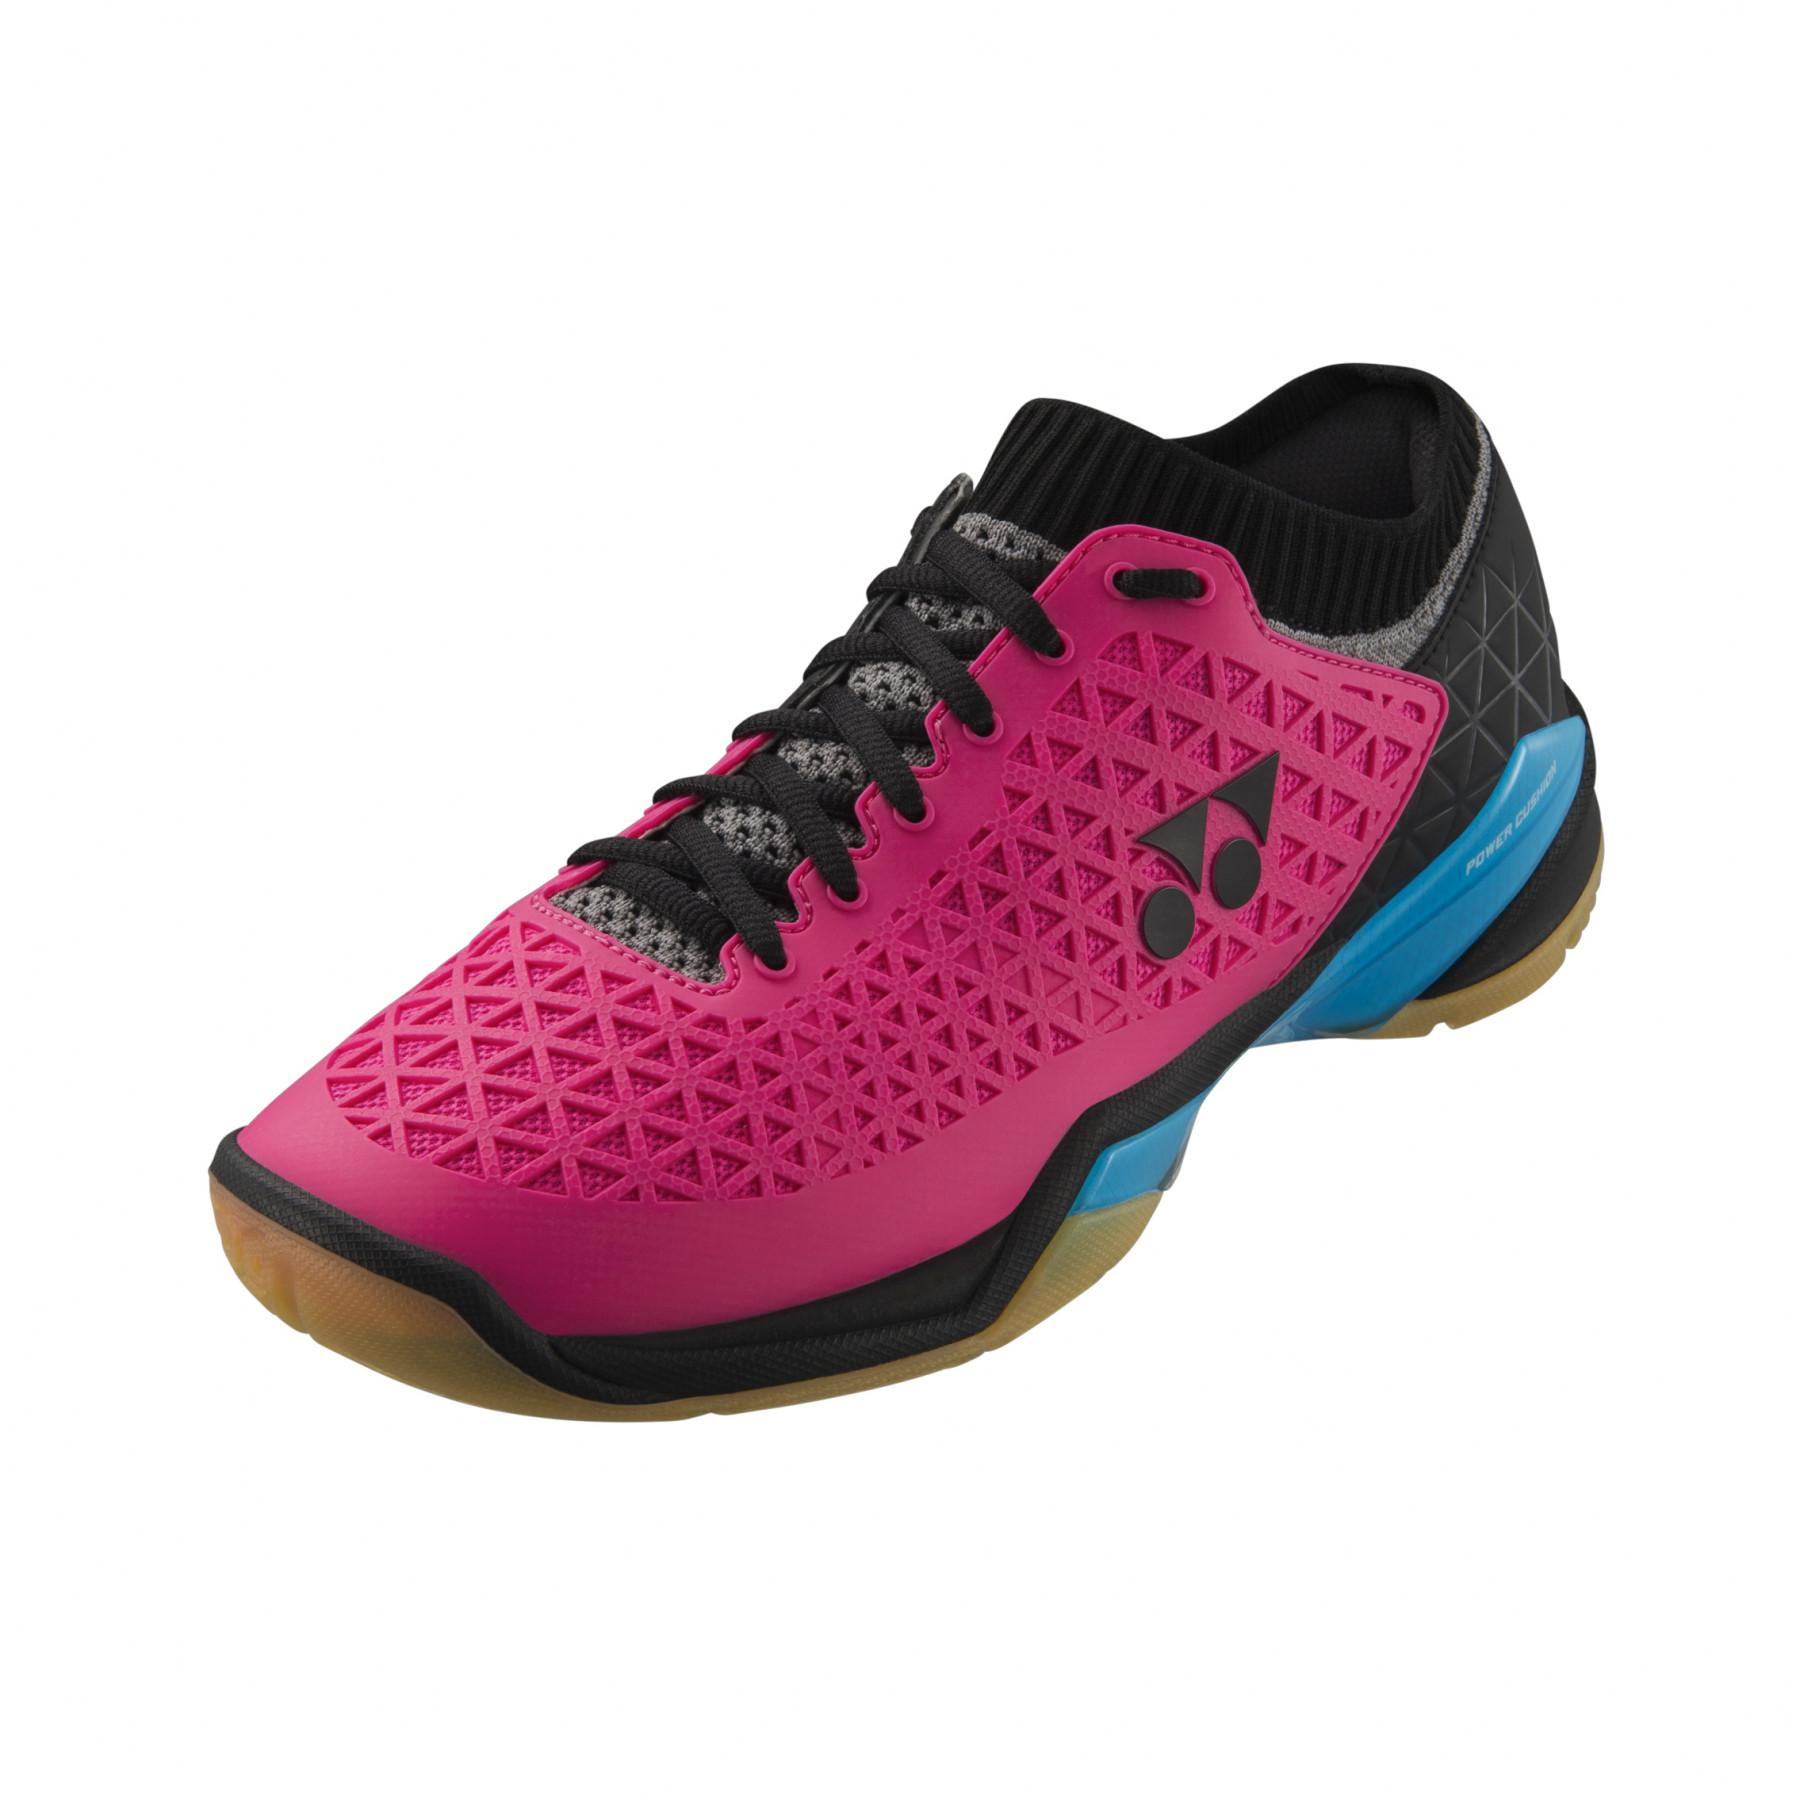 Women's shoes Yonex Eclipsion 2